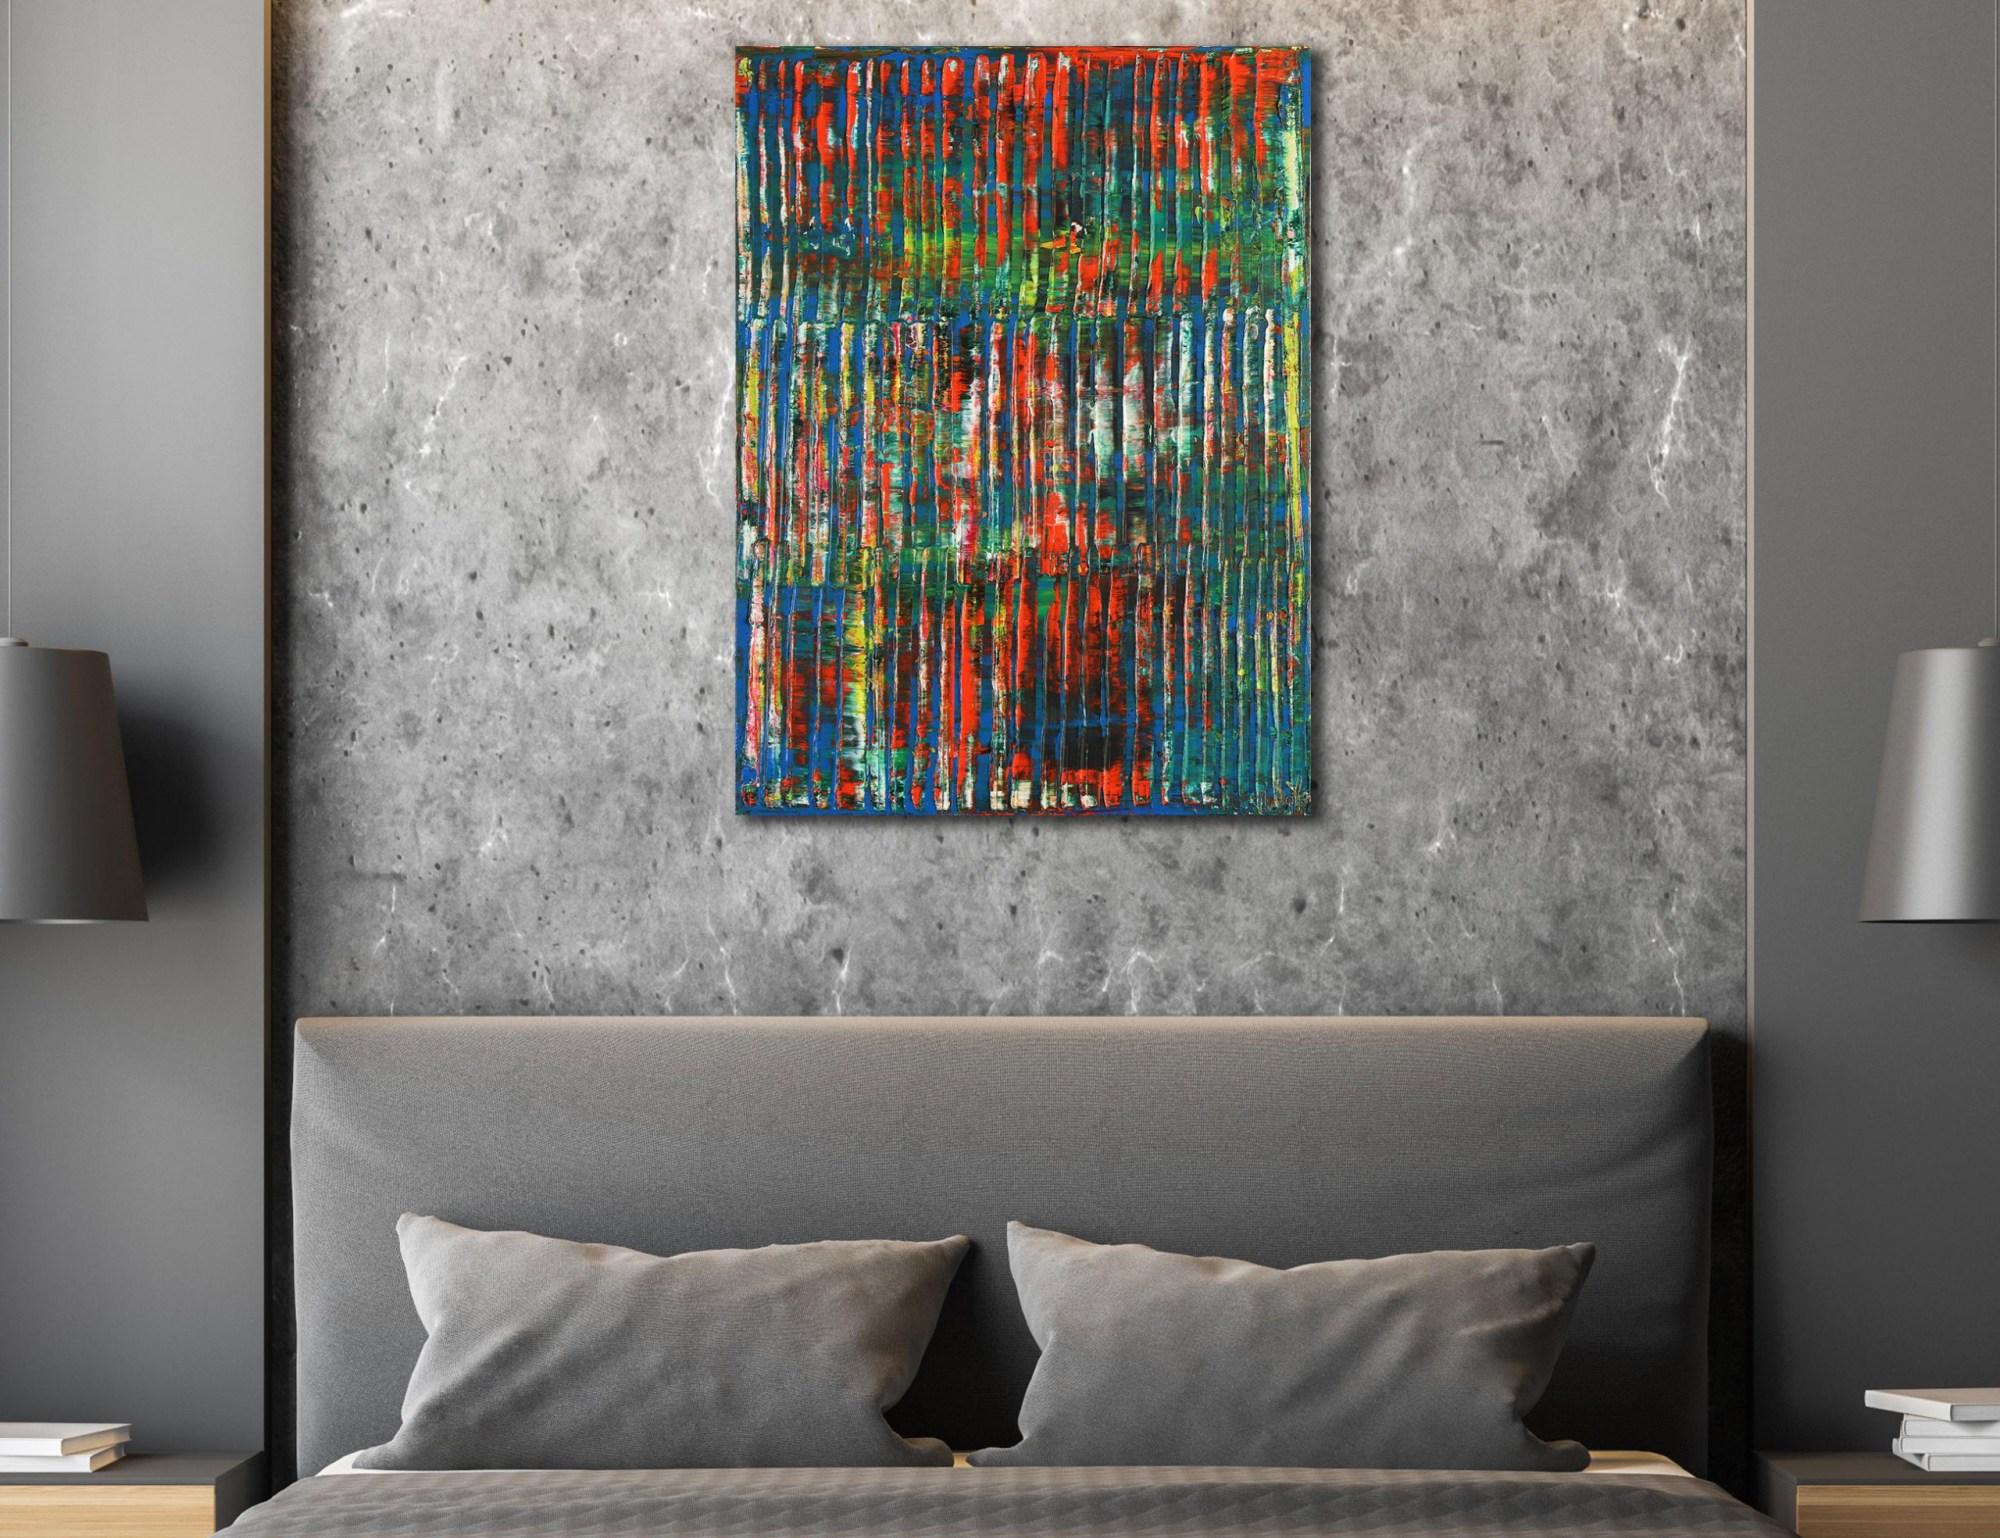 A Color Equation 2 (2021) / Room example / 18x24 / Artist: Nestor Toro